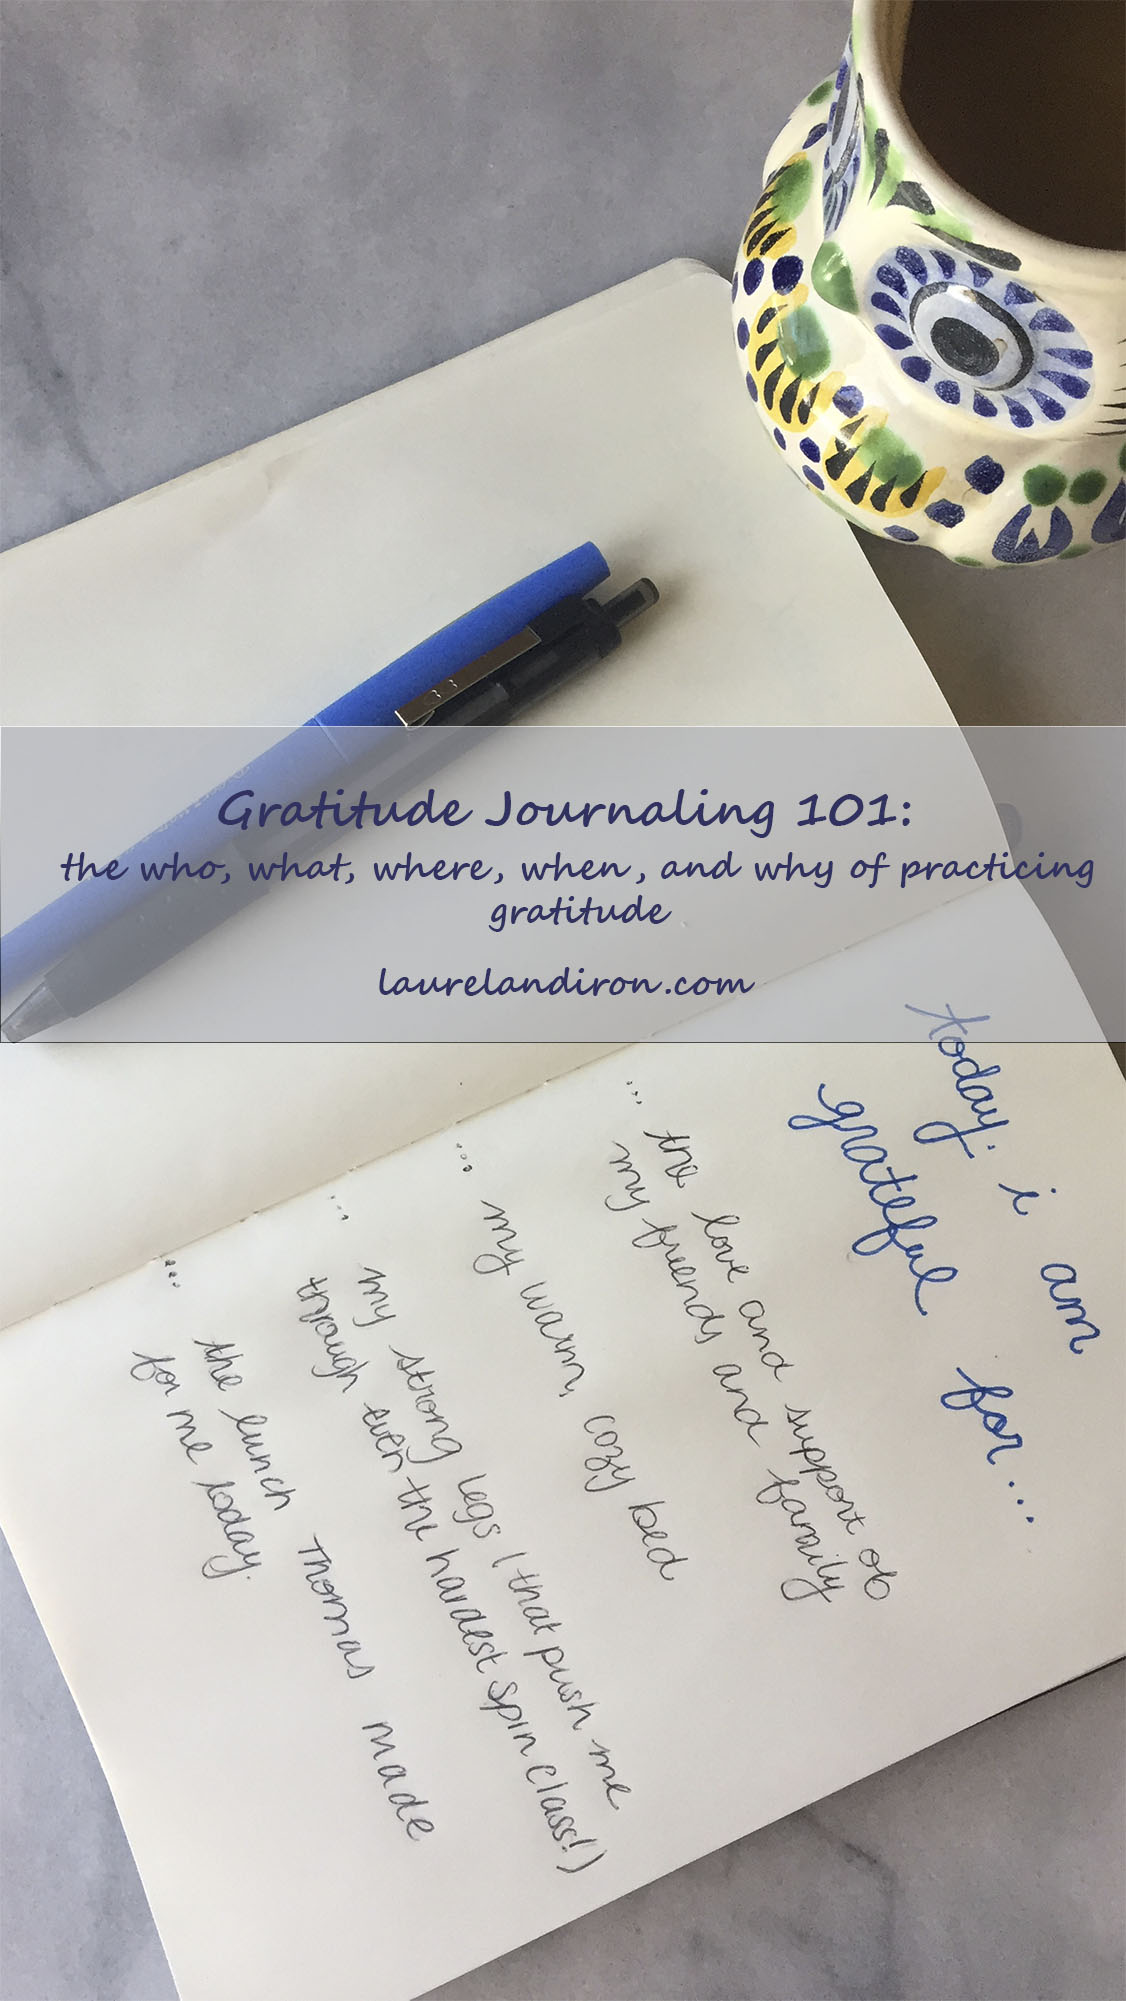 Gratitude Journaling 101.jpg